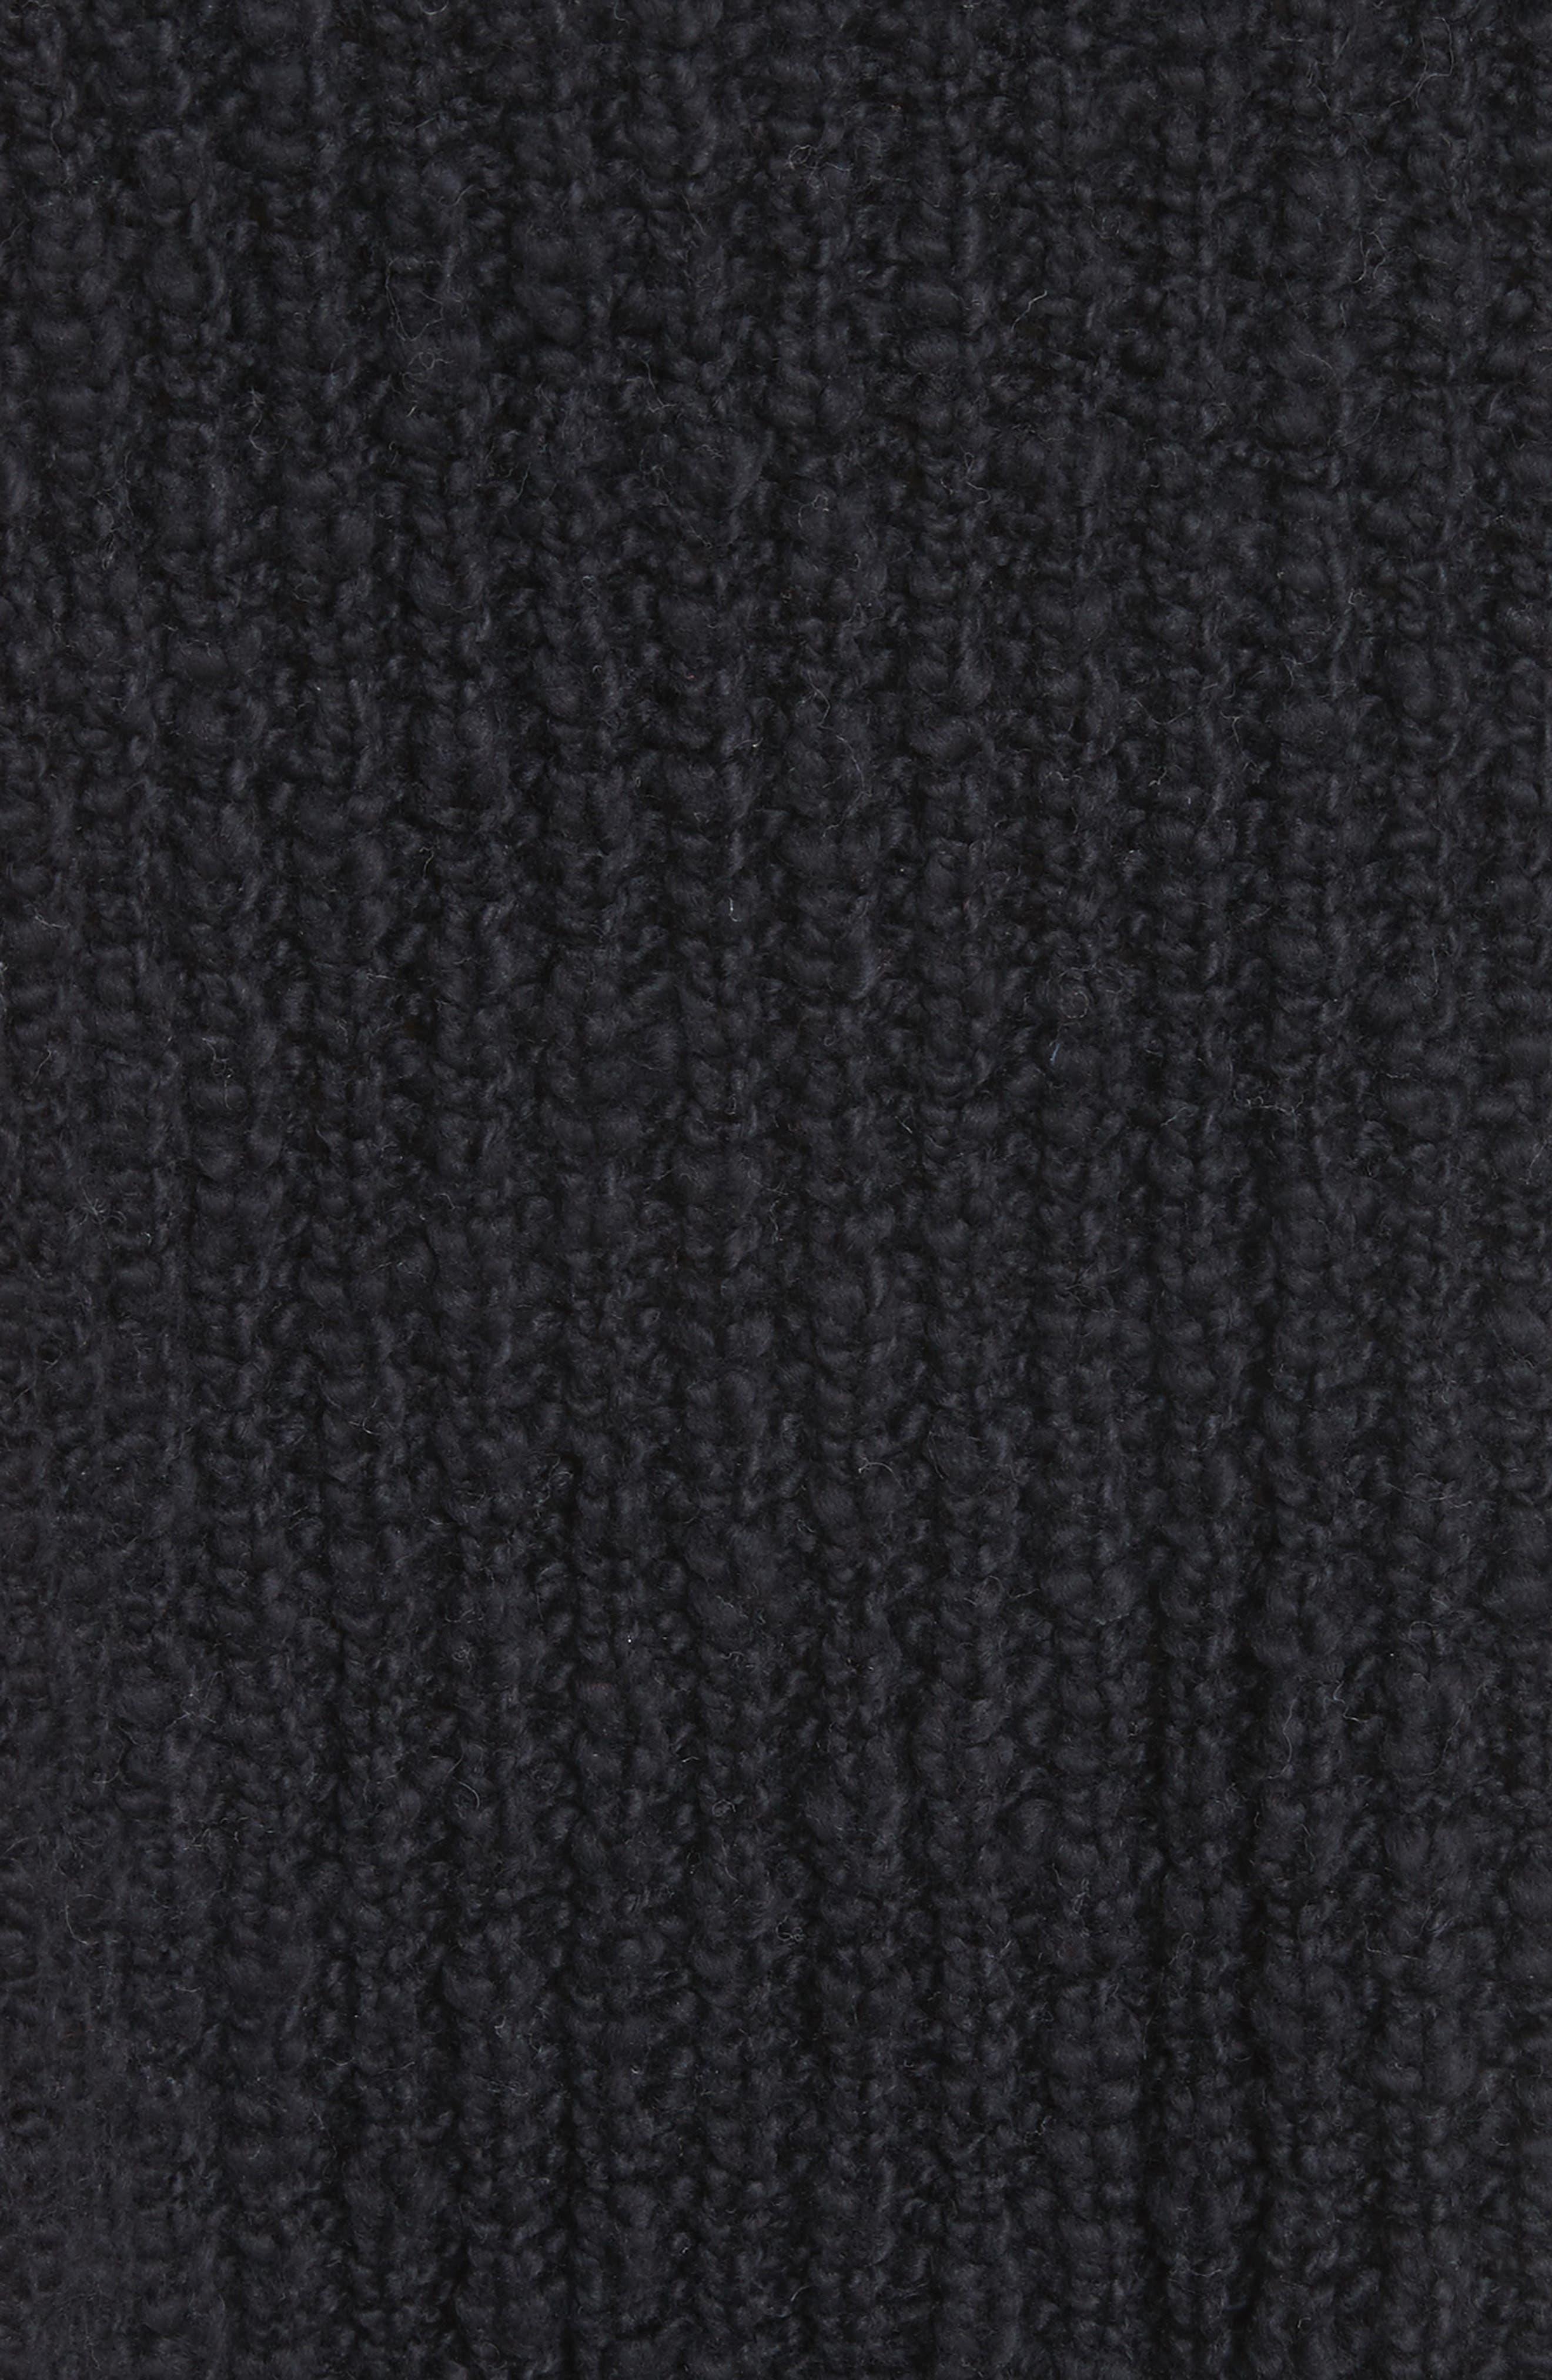 Pandora's Boatneck Sweater,                             Alternate thumbnail 6, color,                             Black